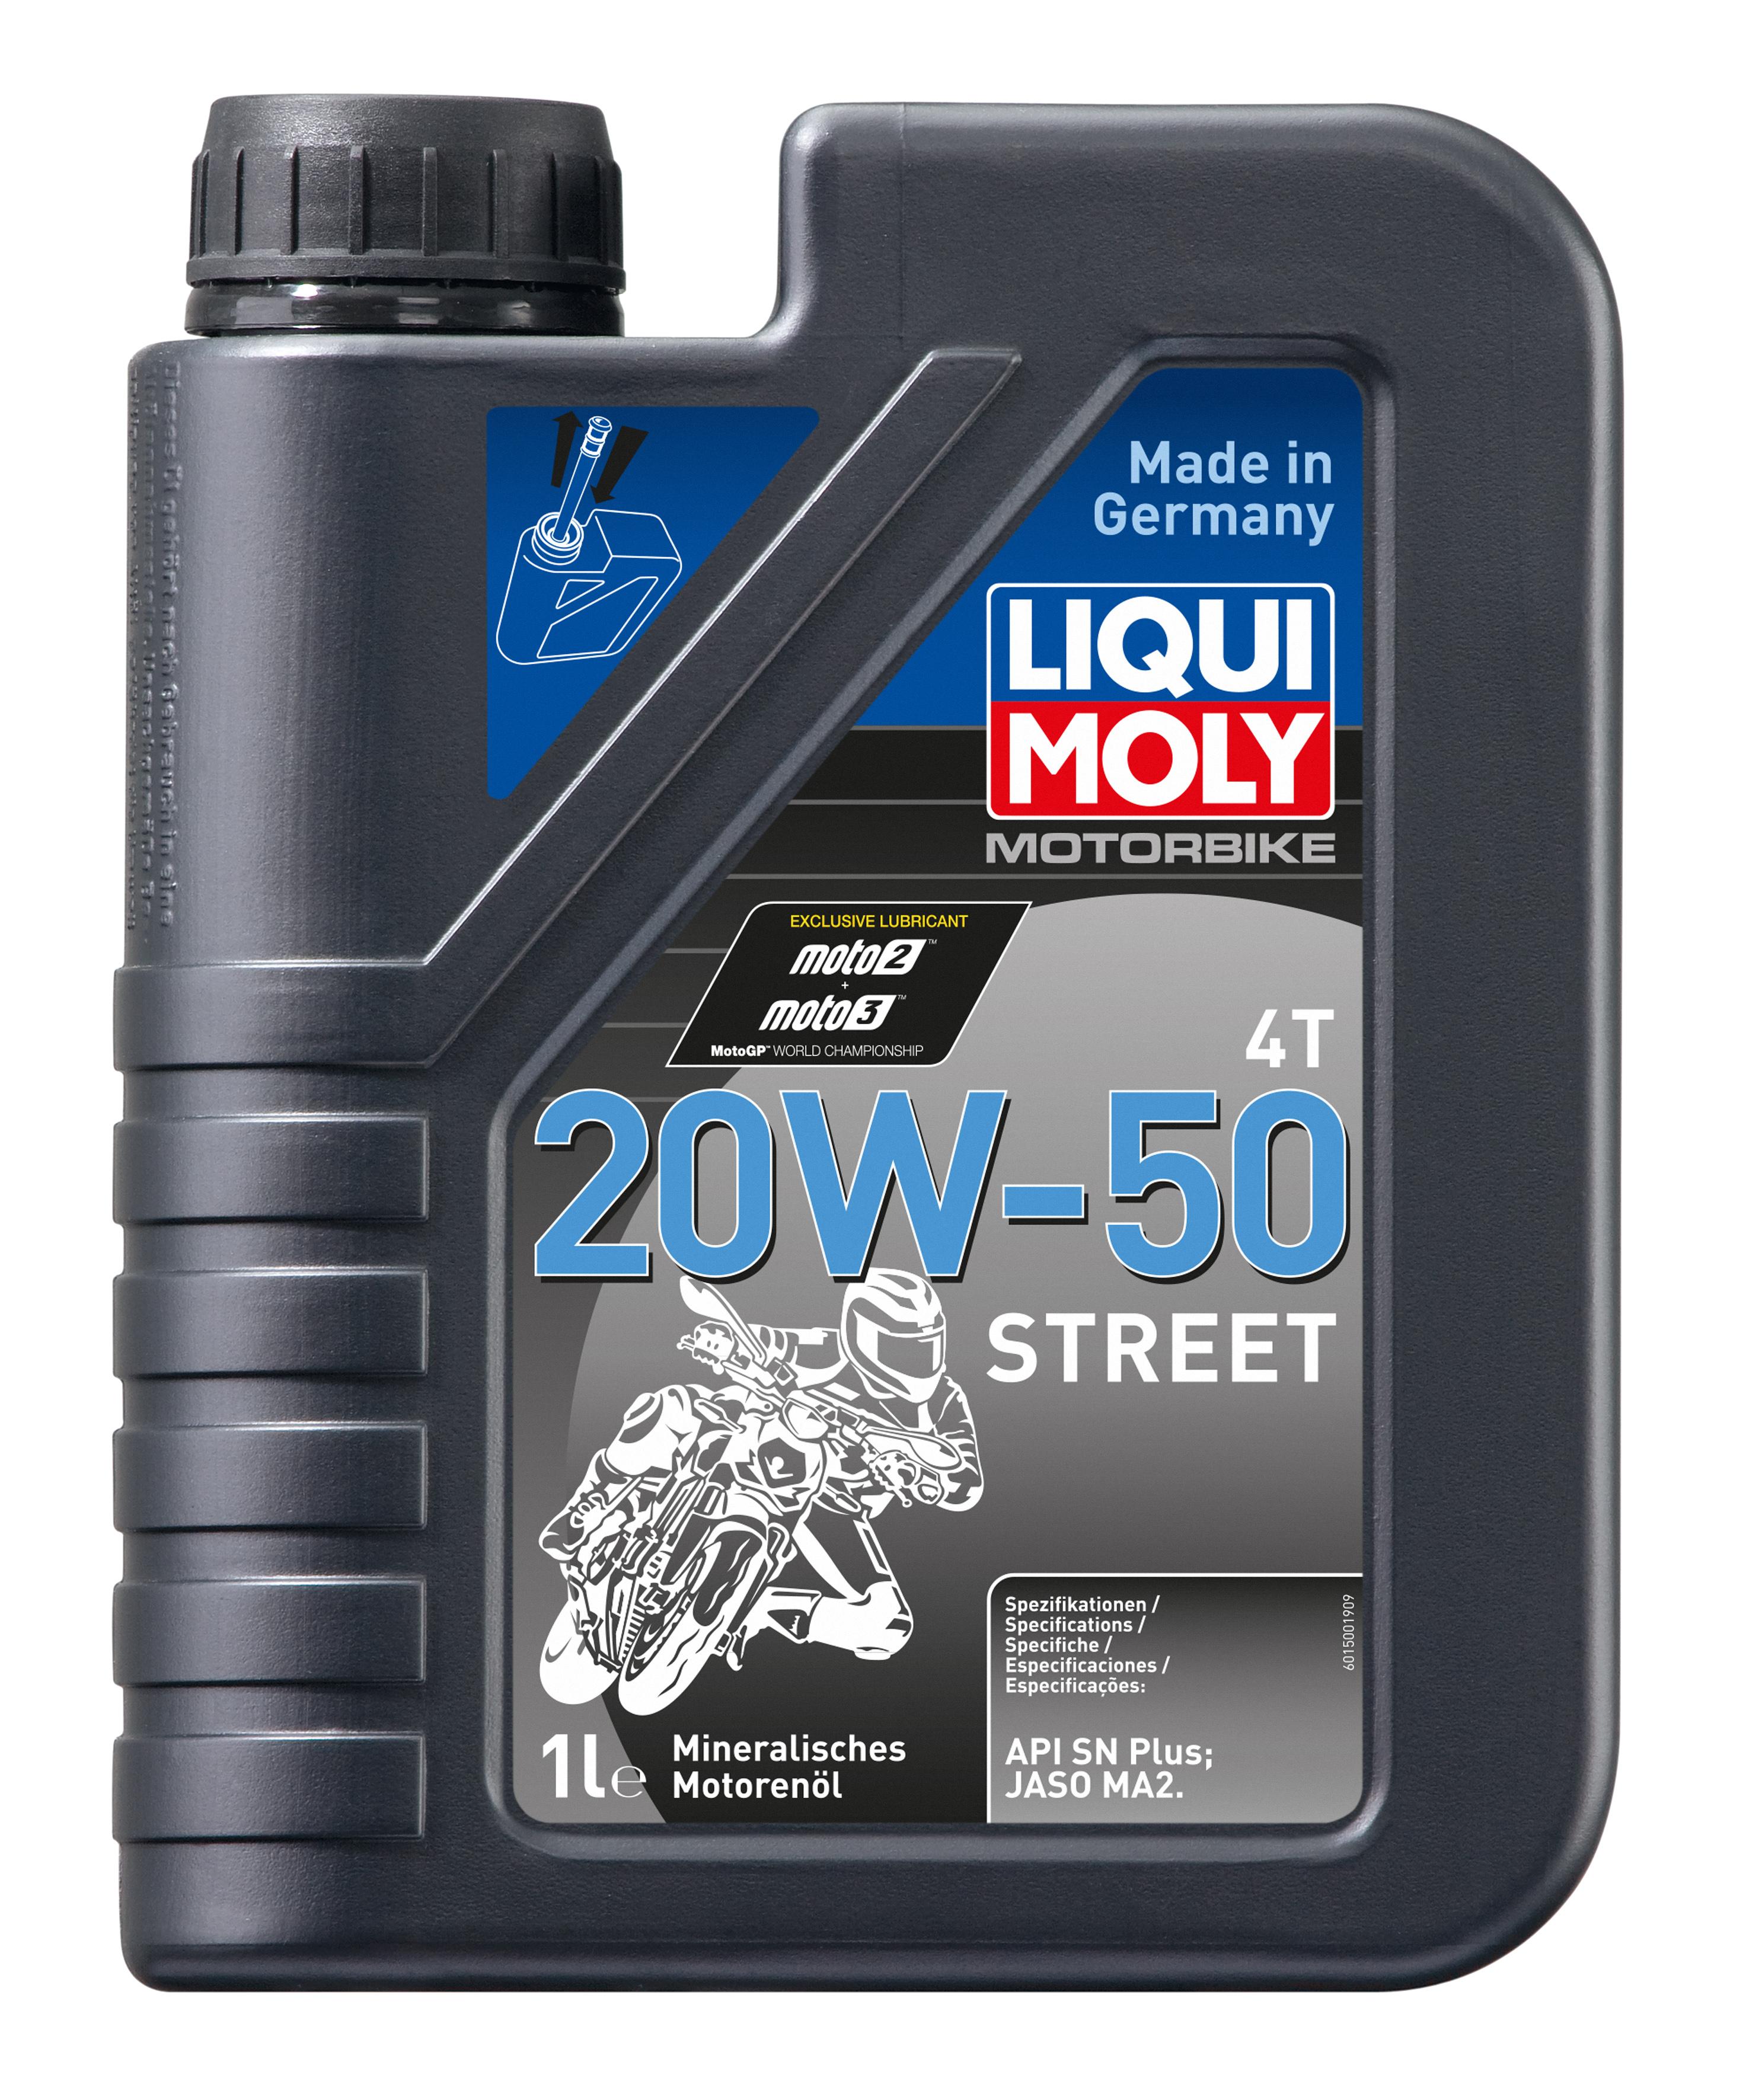 Liqui Moly Motorrad 4T SAE 20W-50